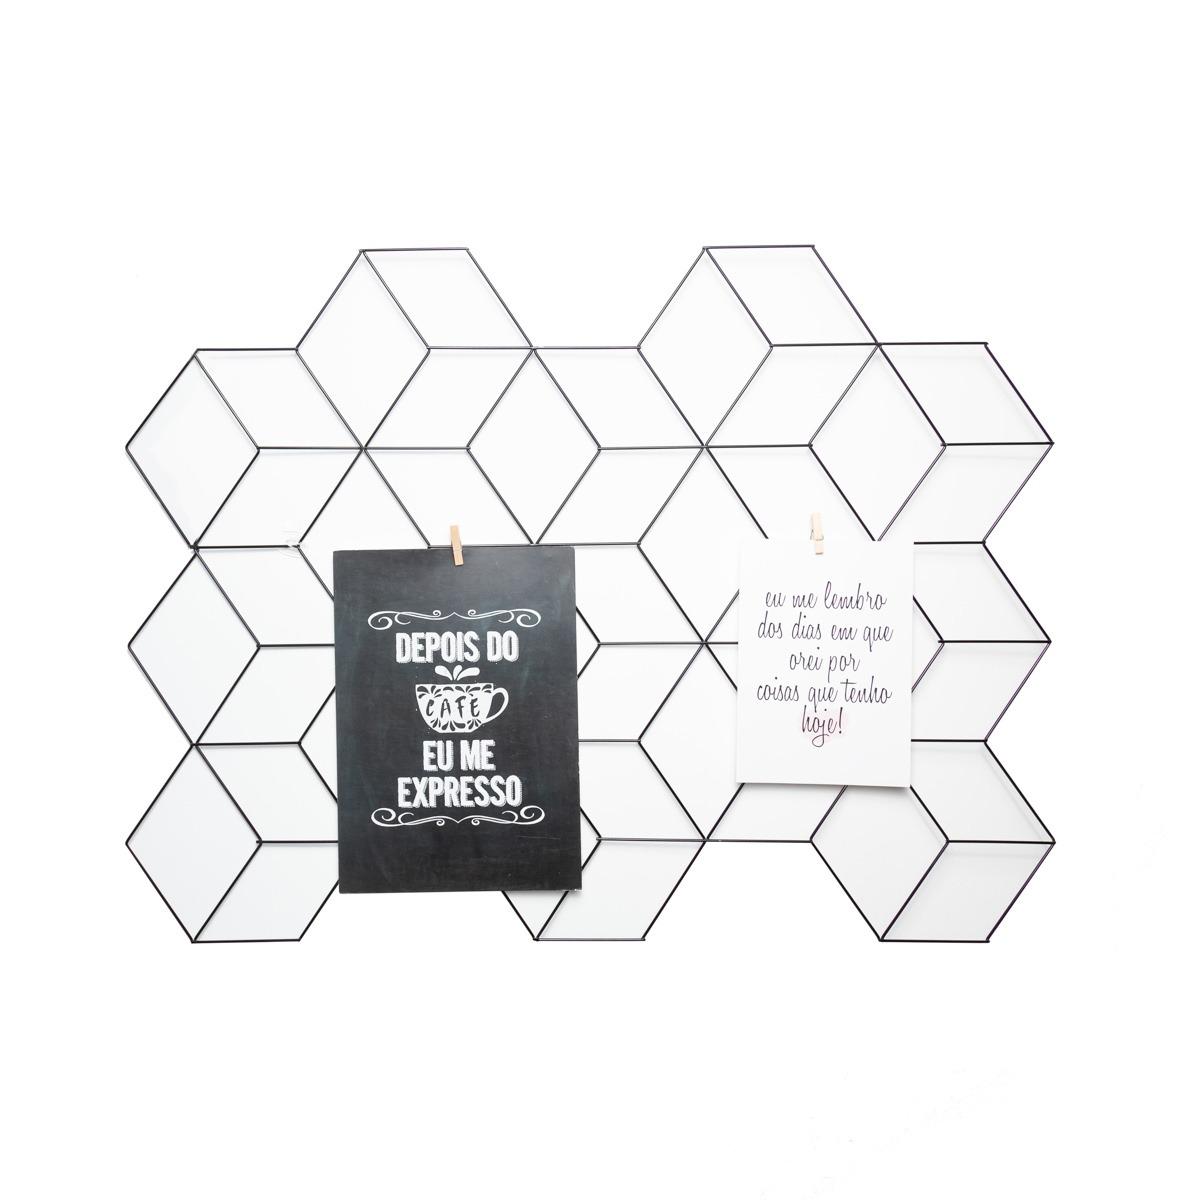 Aramado memory board cubo preto + 10 pregadores